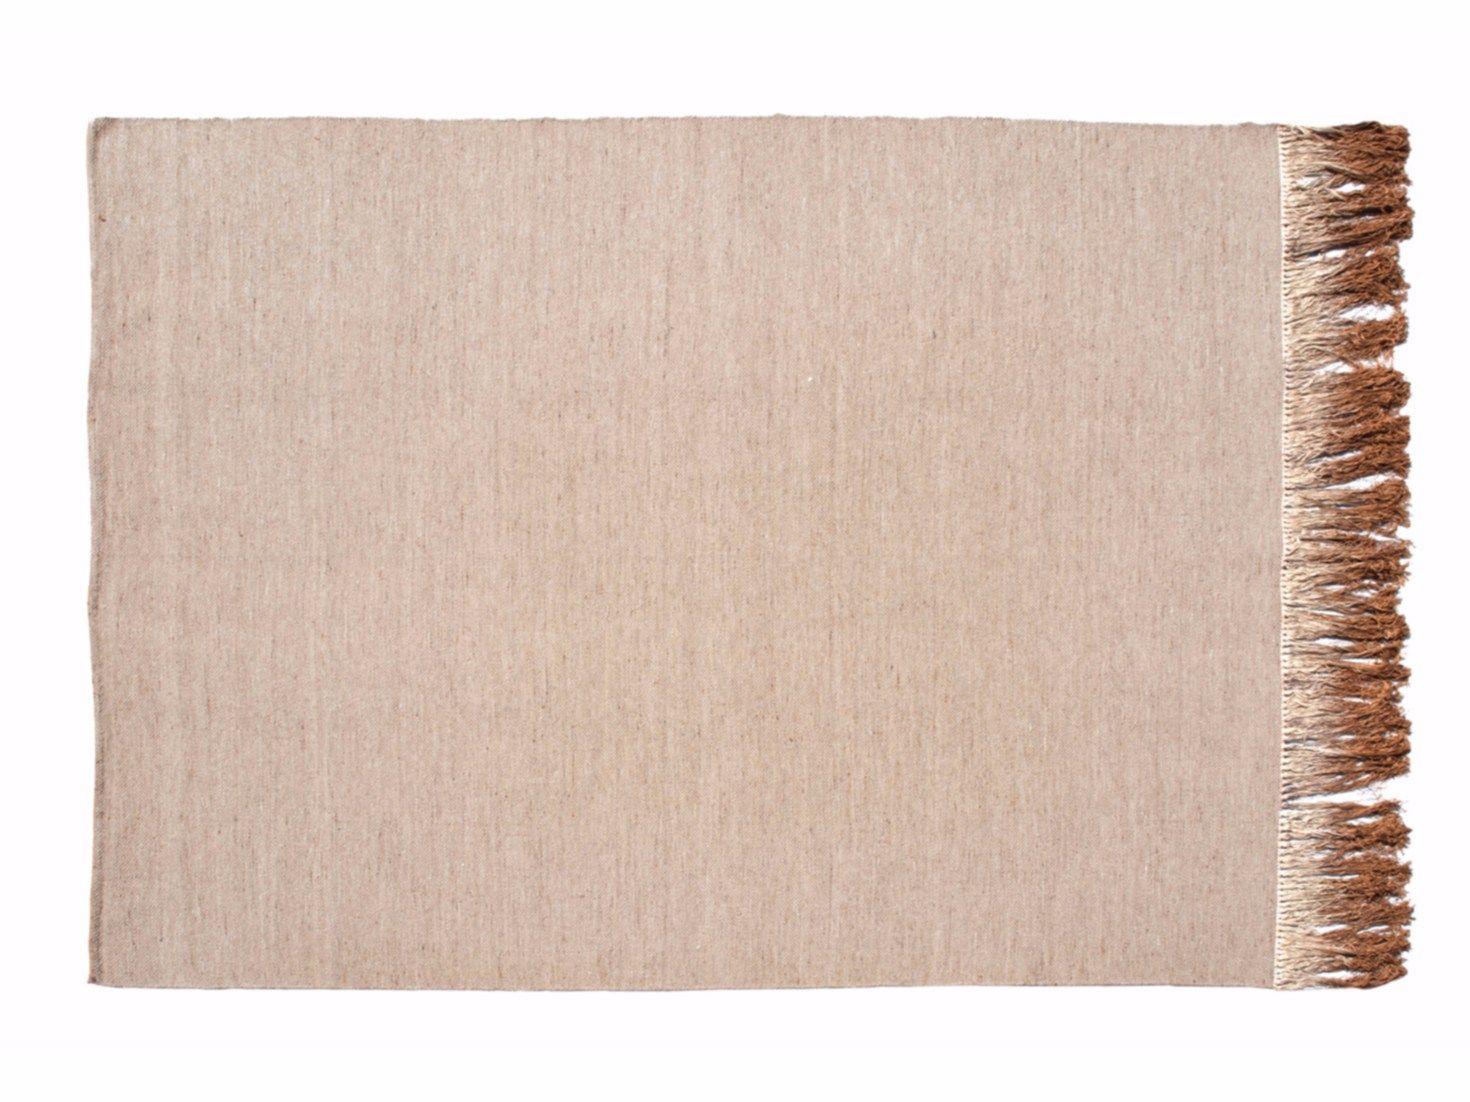 illusion tapis by roche bobois. Black Bedroom Furniture Sets. Home Design Ideas